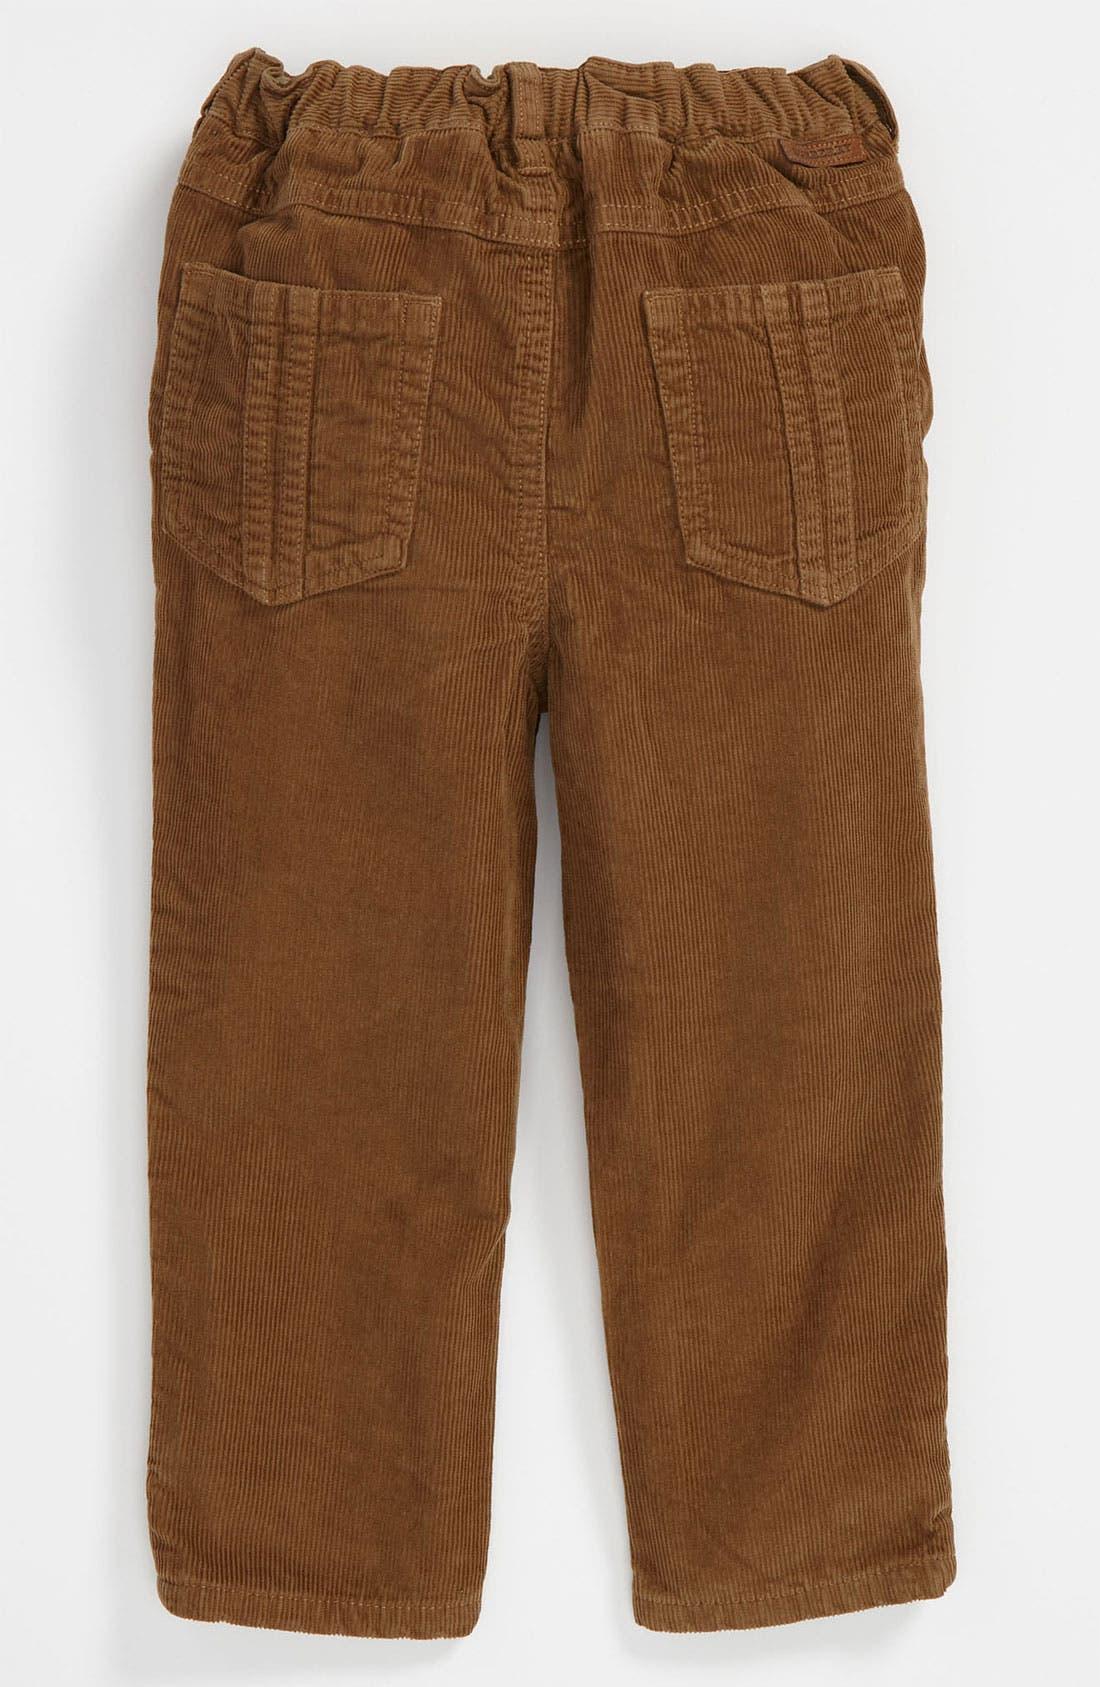 Main Image - Burberry Corduroy Pants (Toddler)